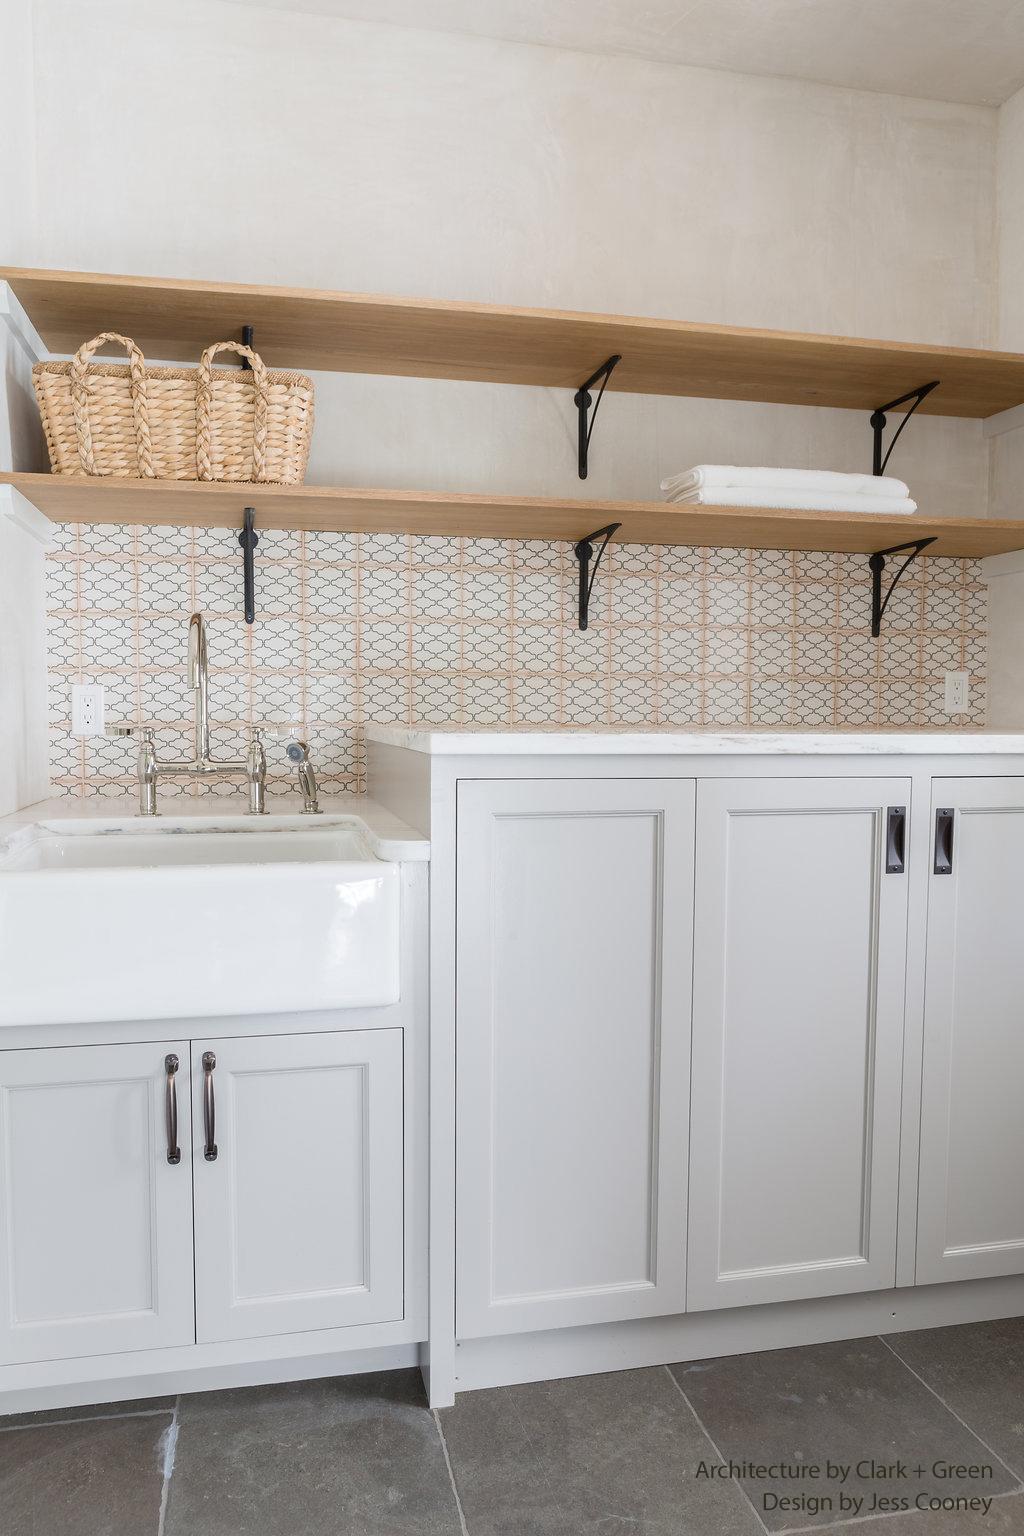 laundry-room-cabinets-closed.jpg